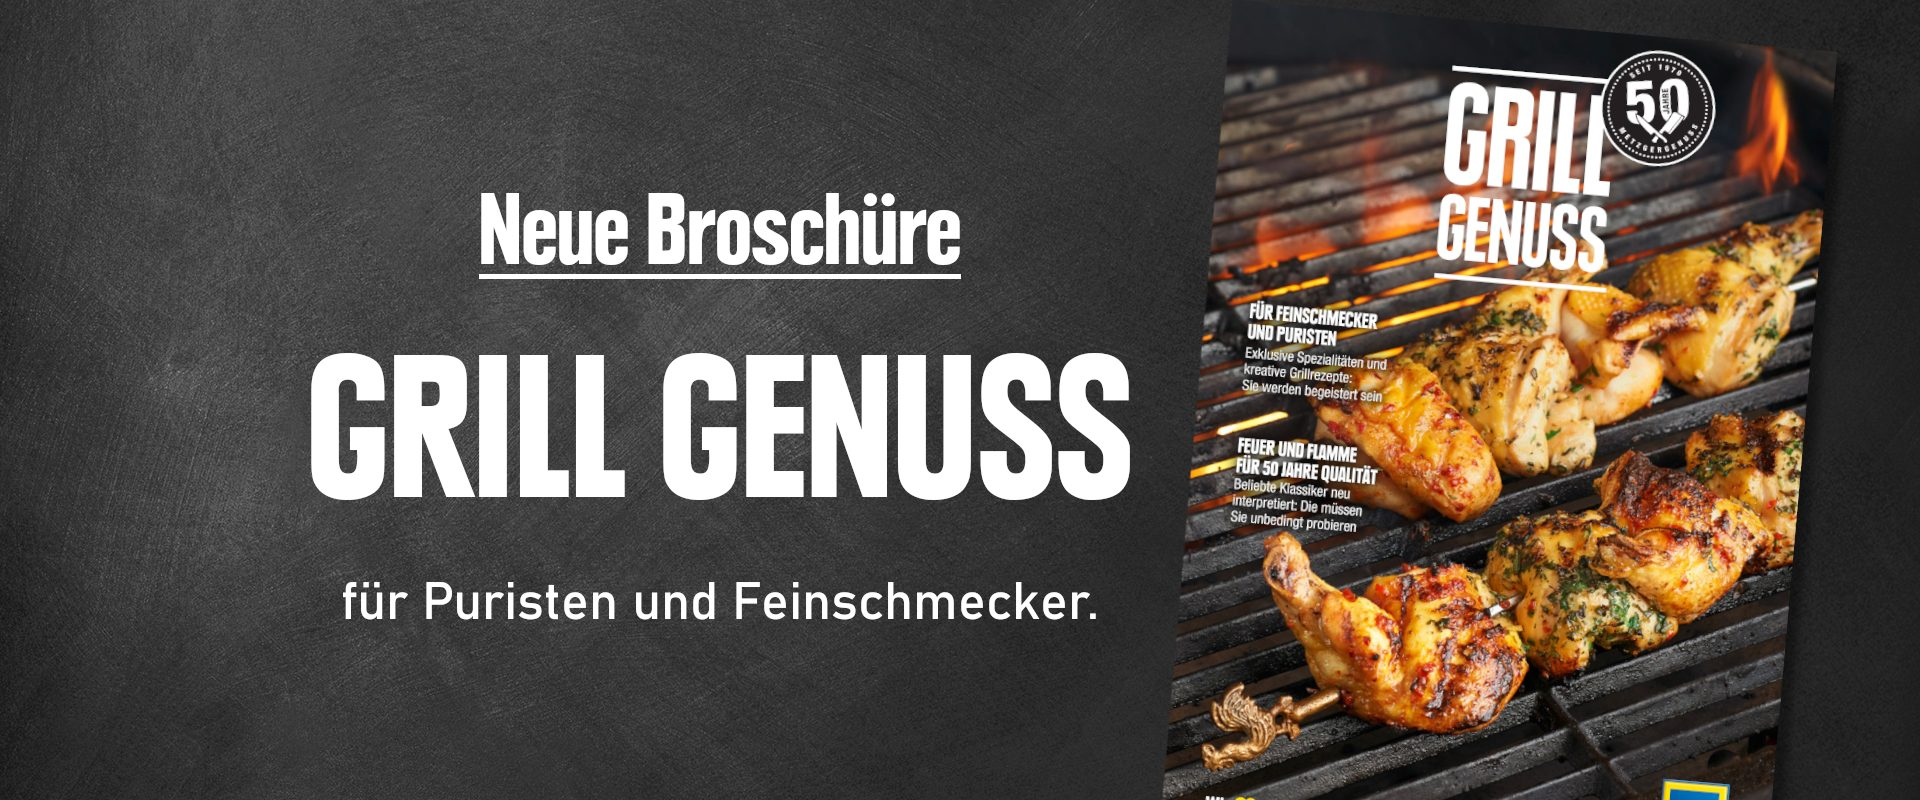 1920x1080 Broschüre Grillgenuss 2020